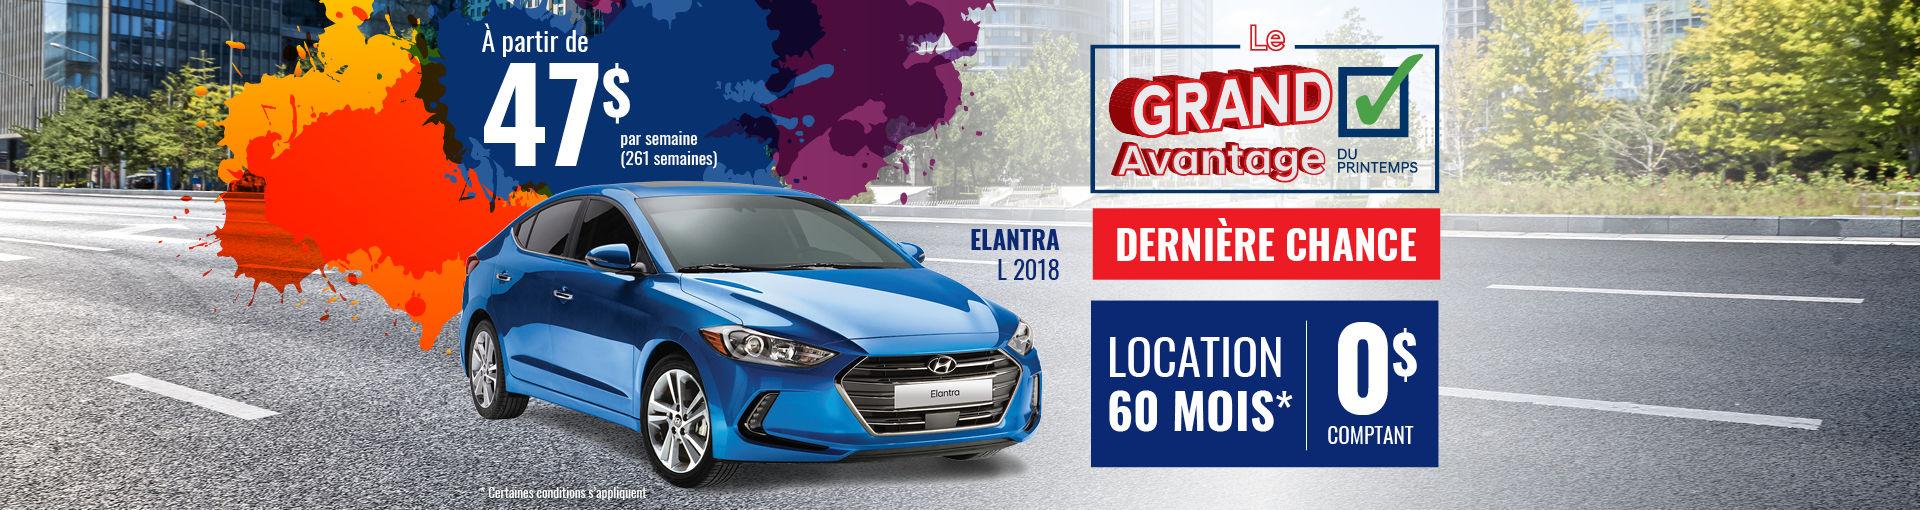 Promo Hyundai Casavant mai 2018-Elantra L 2018